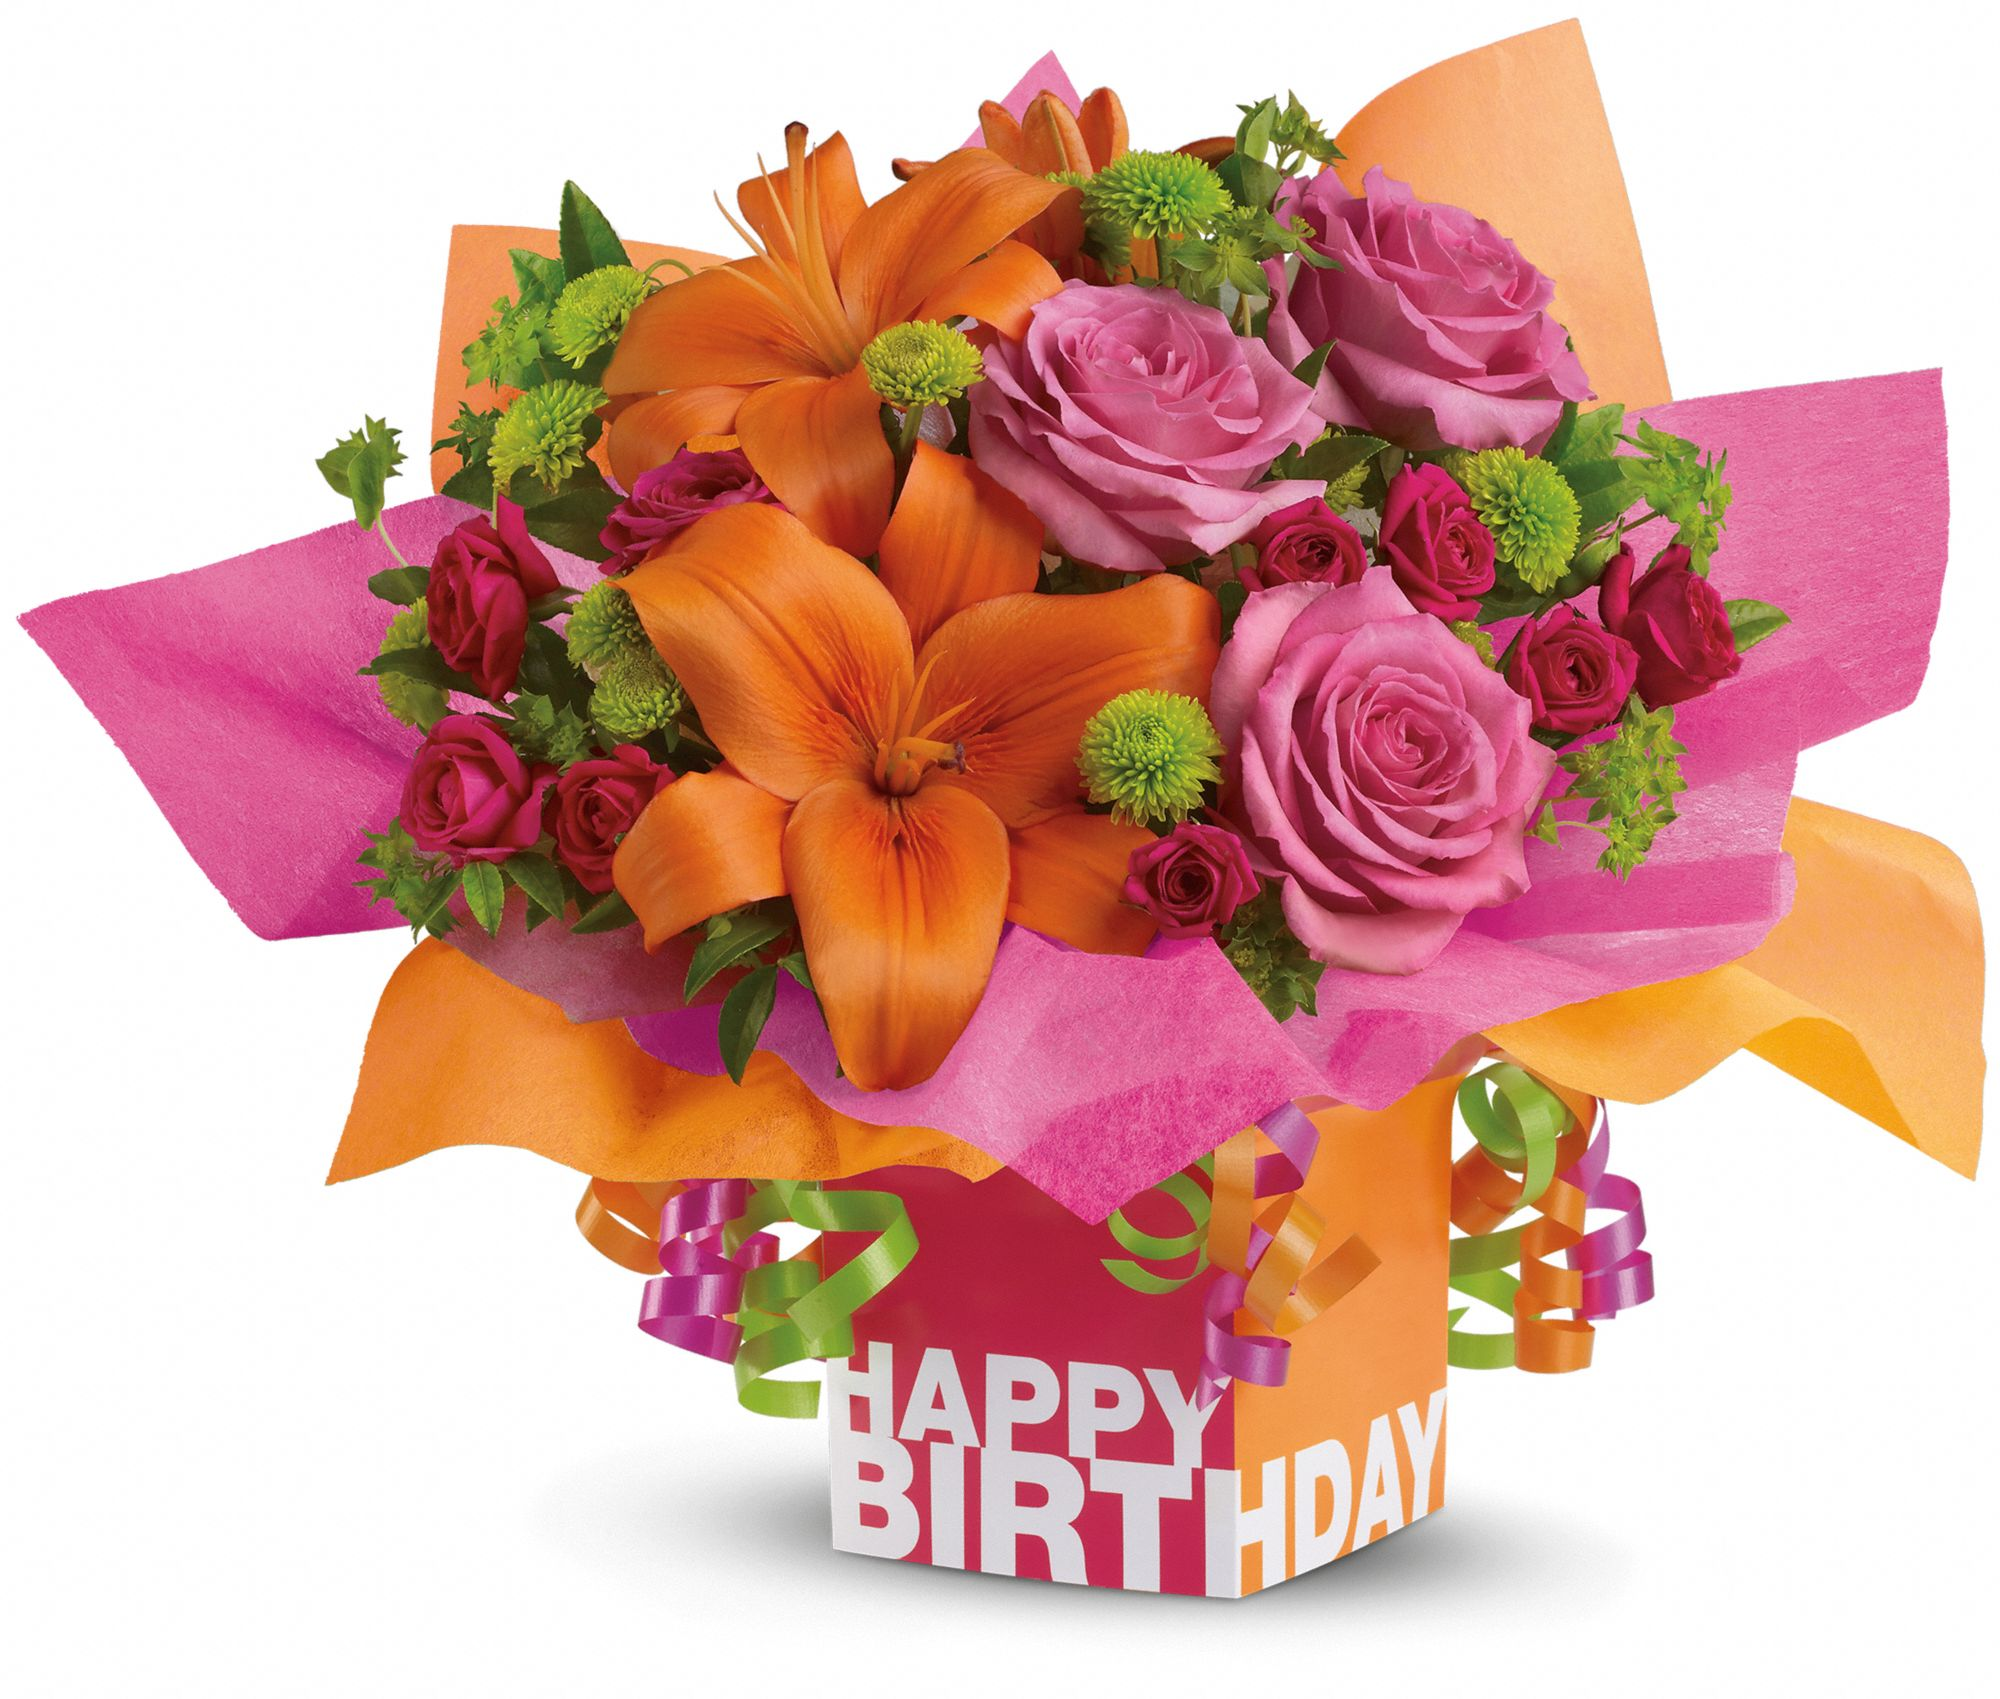 rosy birthday present flowers, rosy birthday present flower bouquet, Beautiful flower